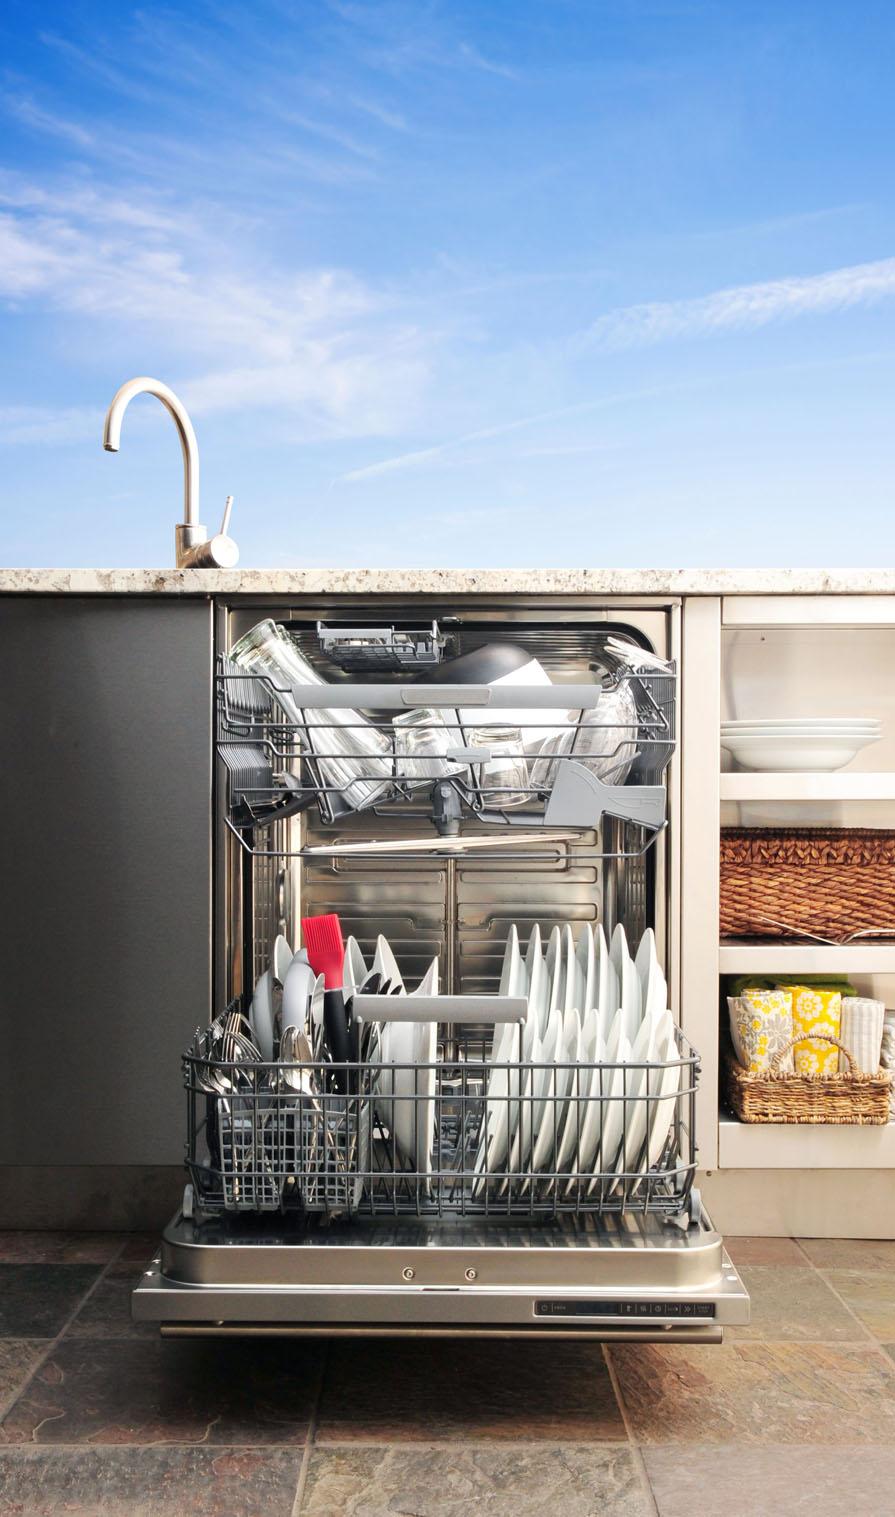 """KOG_Dishwasher_Open_Straight_Full"""